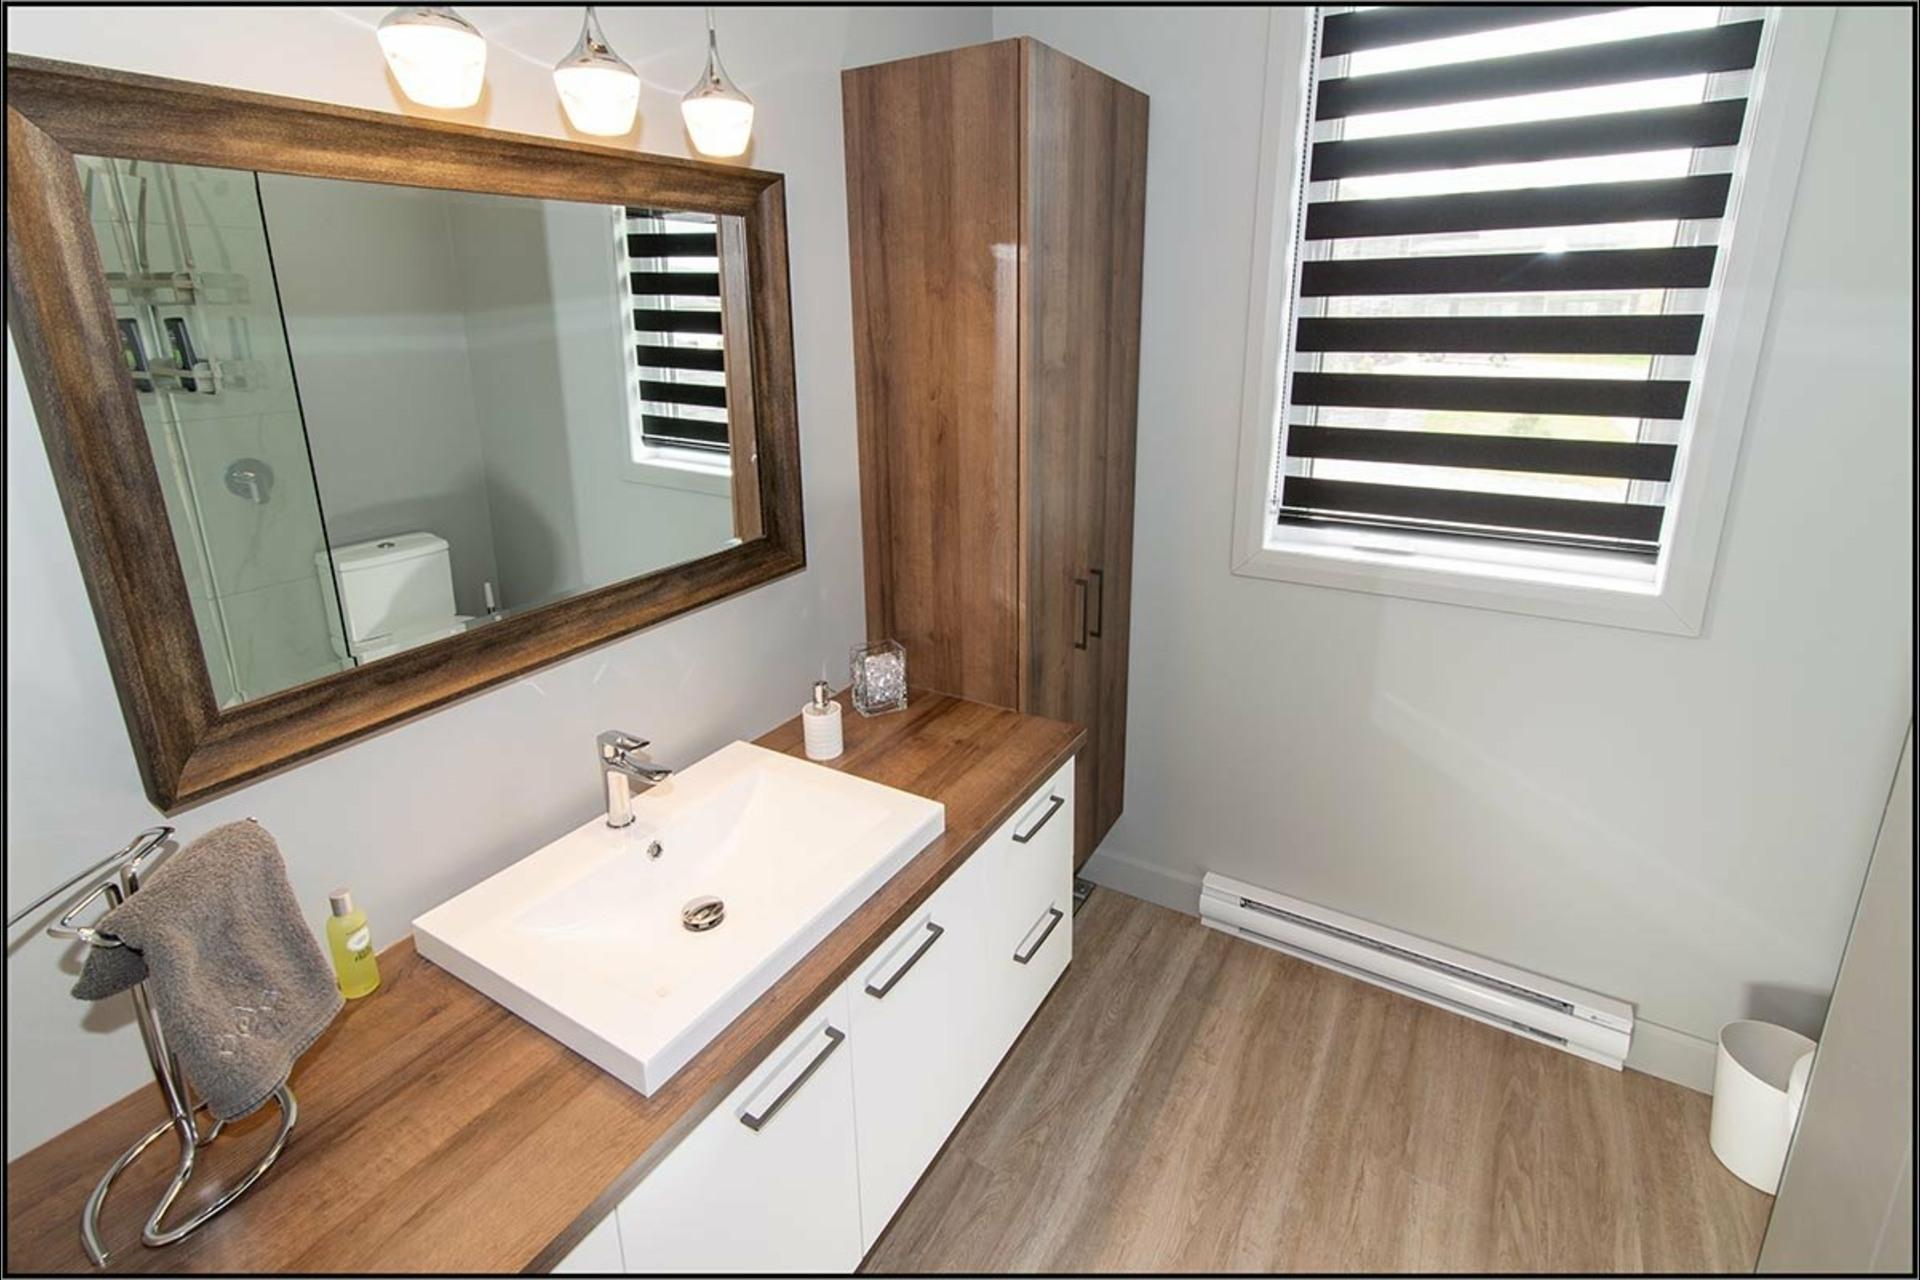 image 11 - Apartment For sale Sainte-Marie - 9 rooms